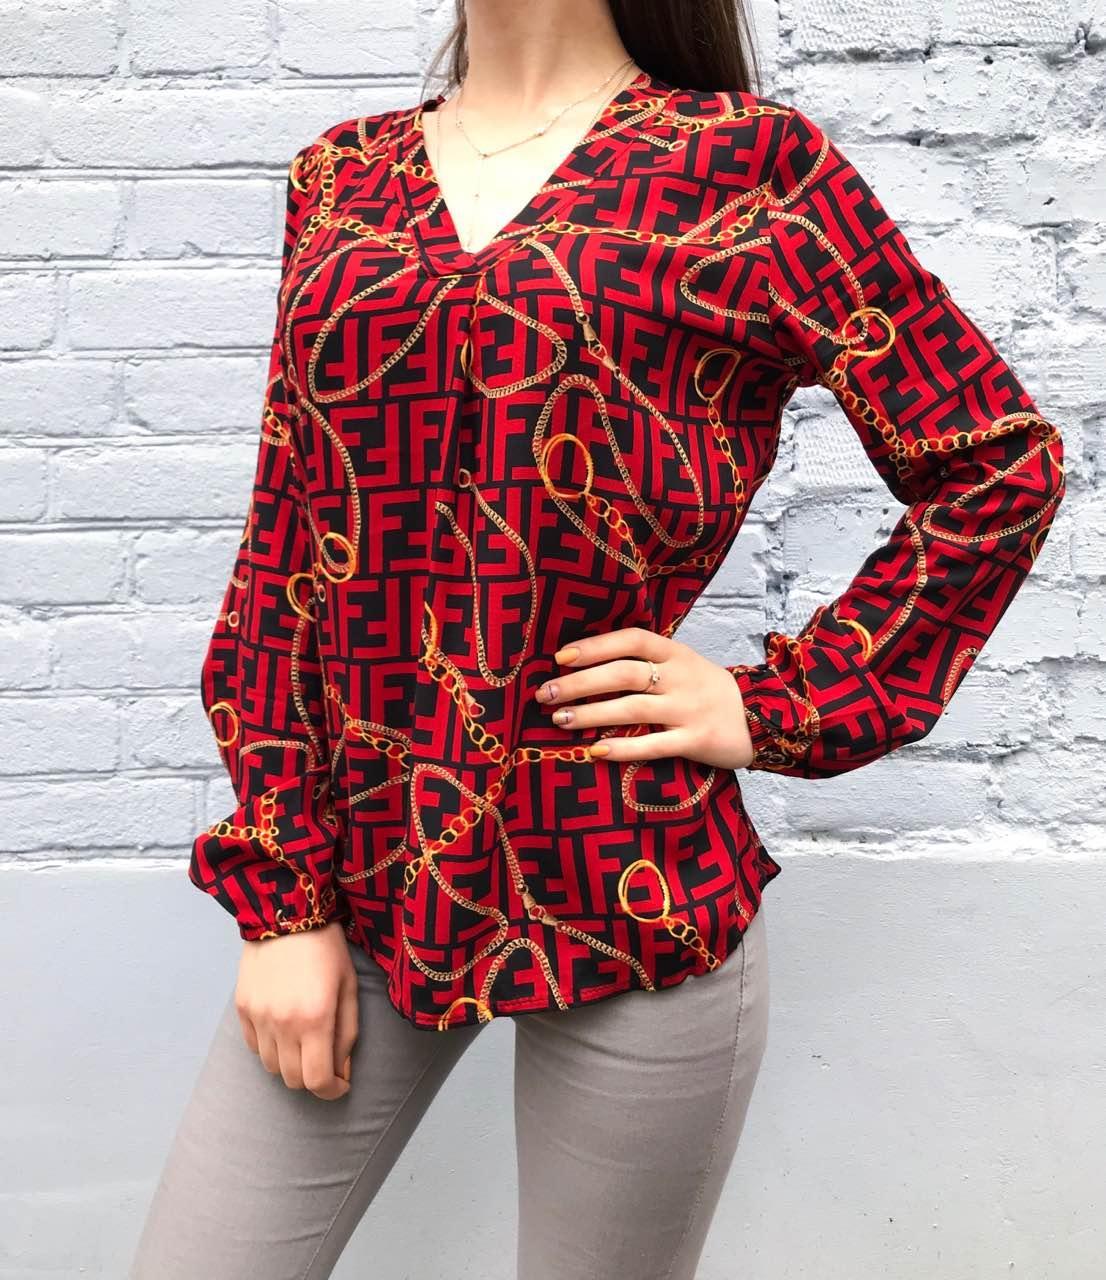 Рубашка женская Fendi цепи (красная) размер S